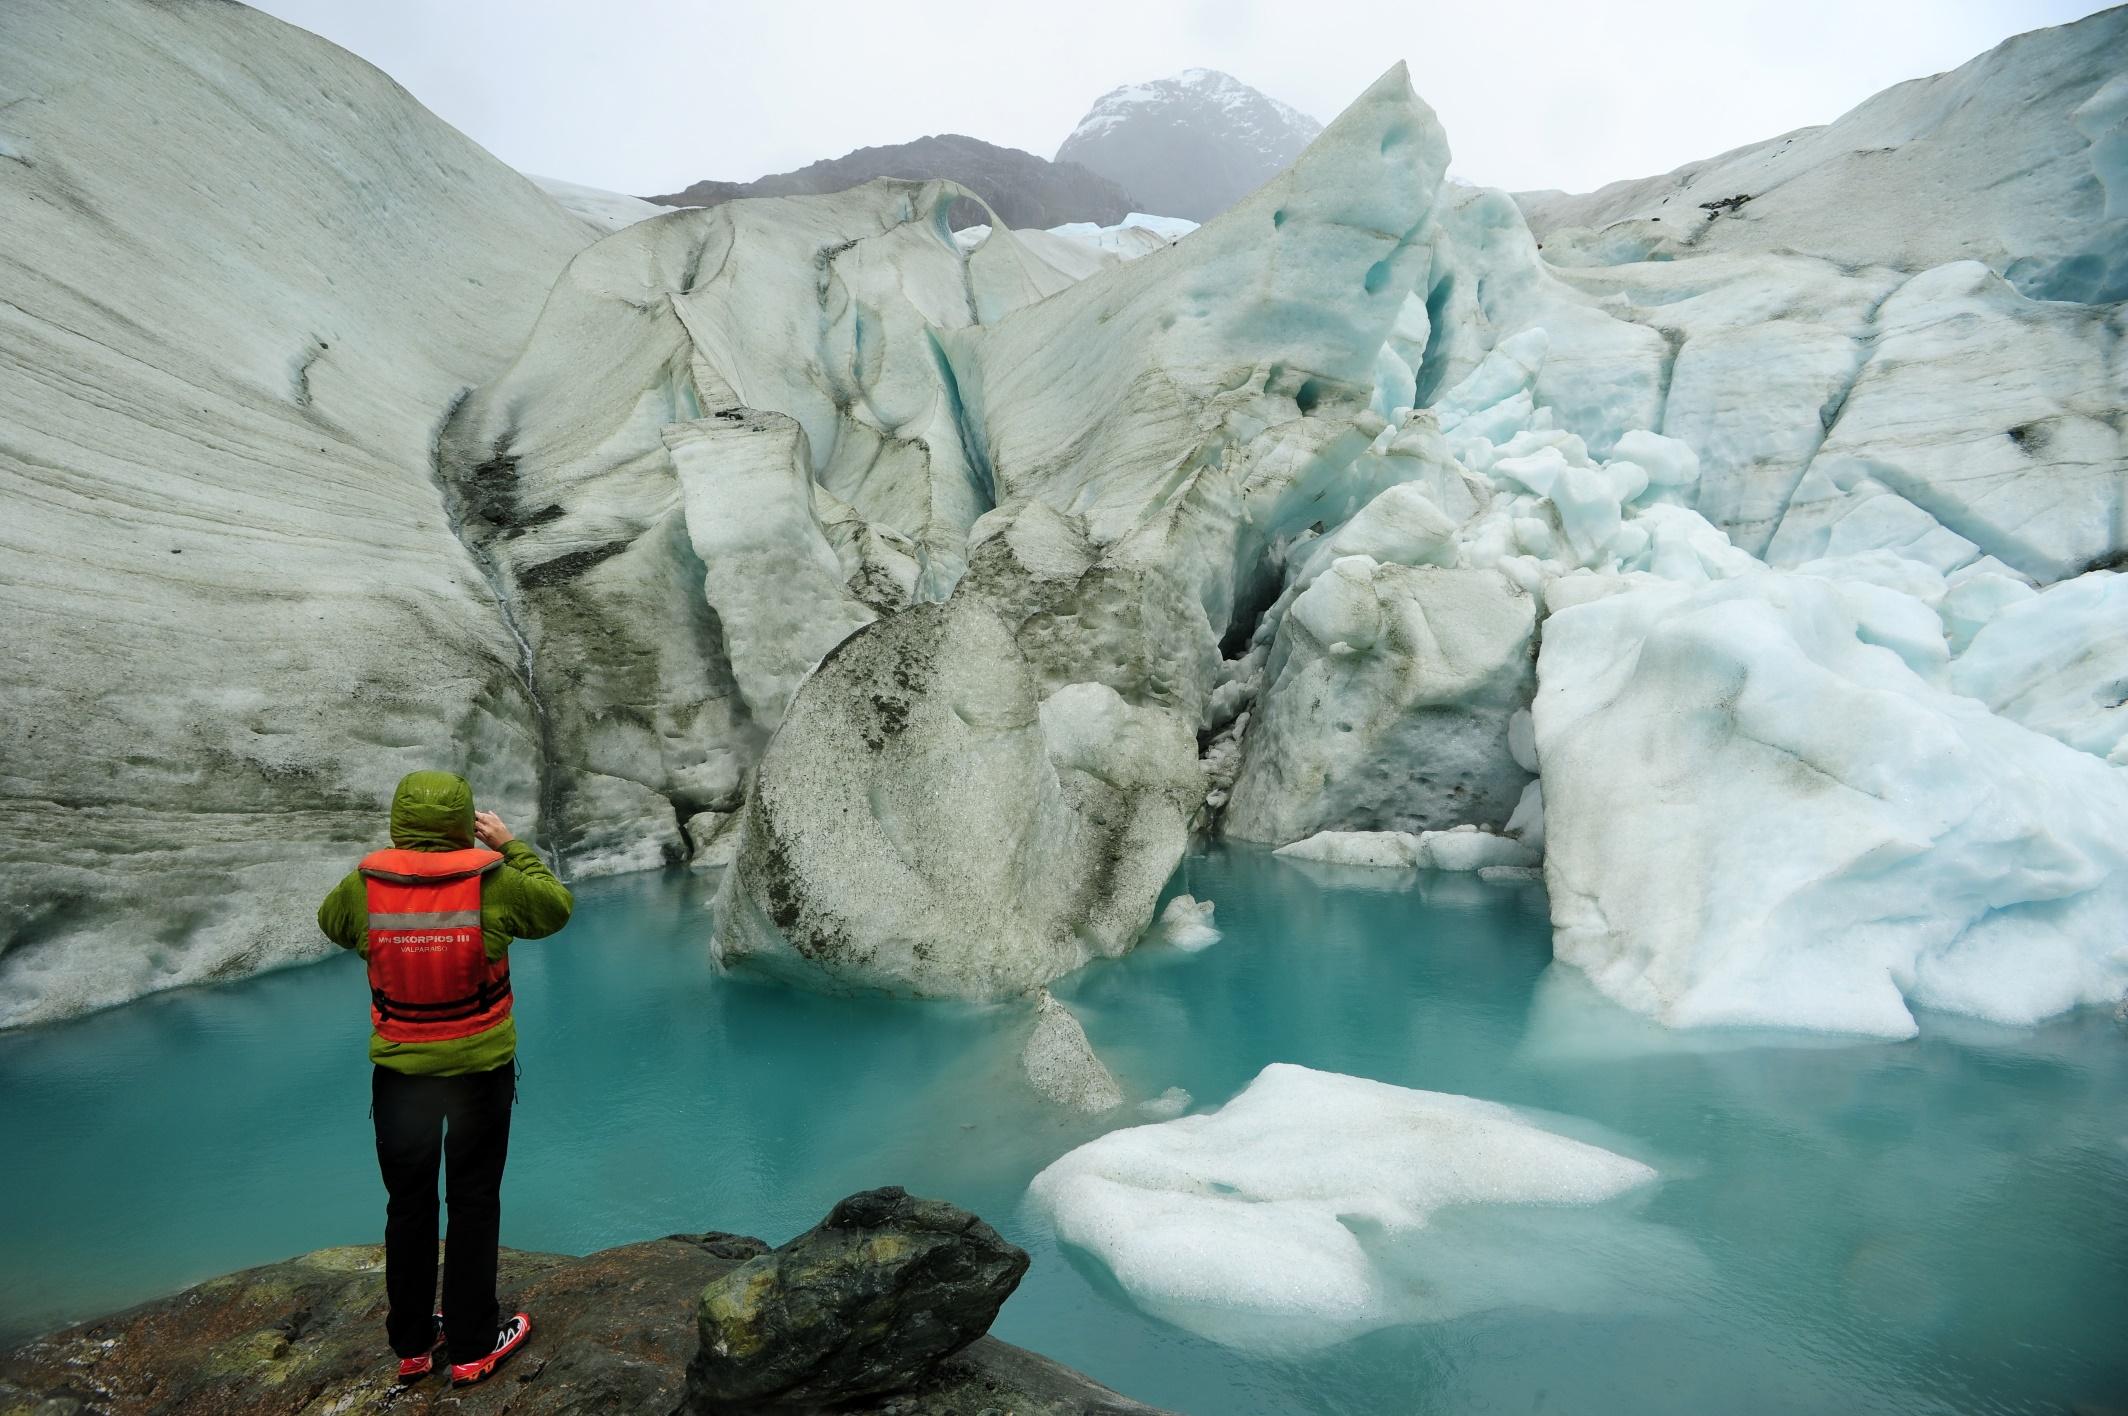 96_Glaciar Bernal en Fiordo de las Montañas - kopie